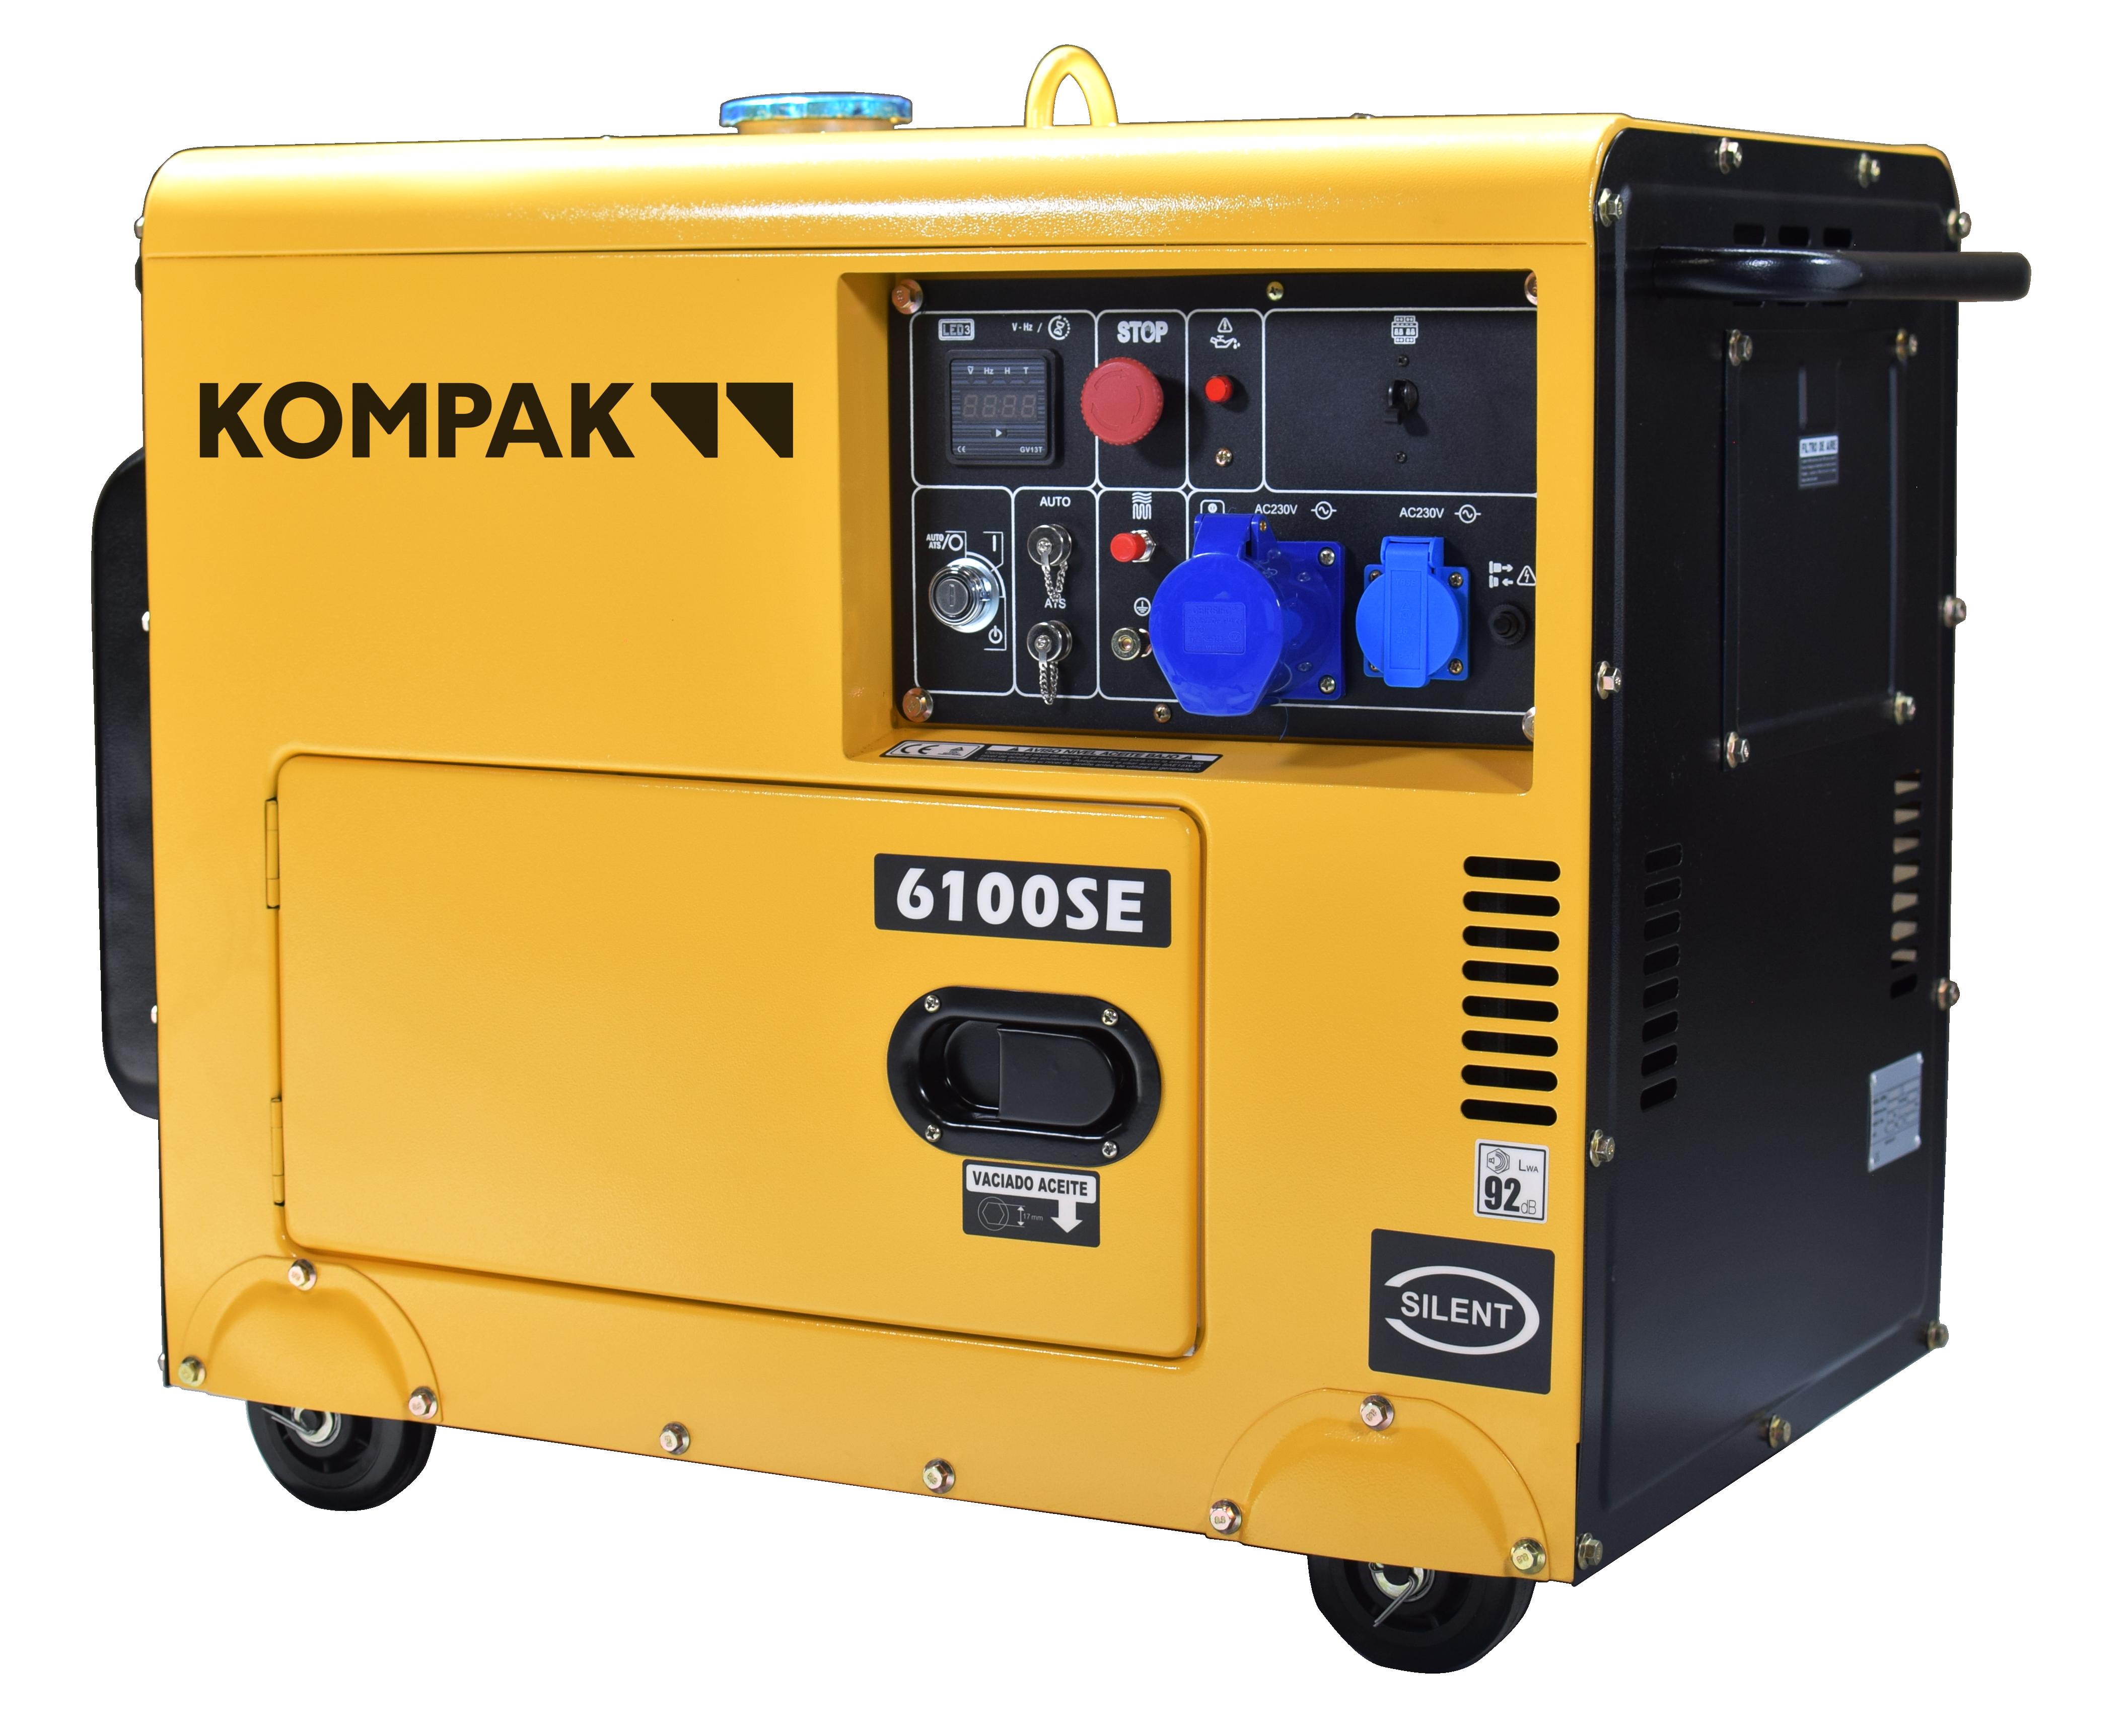 KOMPAK 5500 Watt Diesel 6100SE Stromaggregat